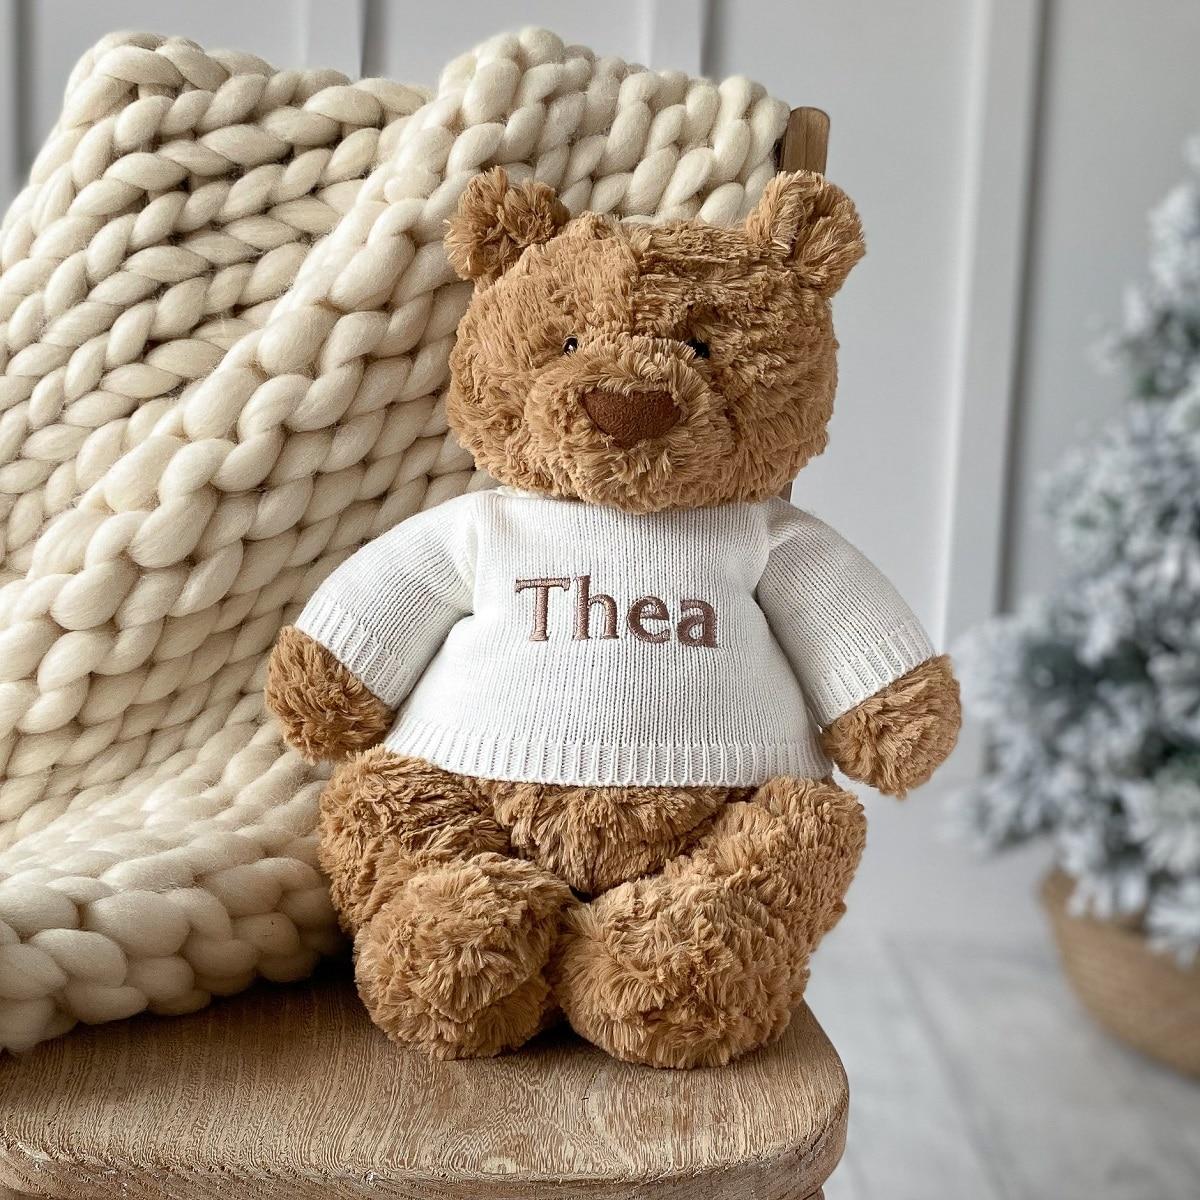 Personalised Jellycat Bartholomew bear large teddy newborn baby gift soft toy